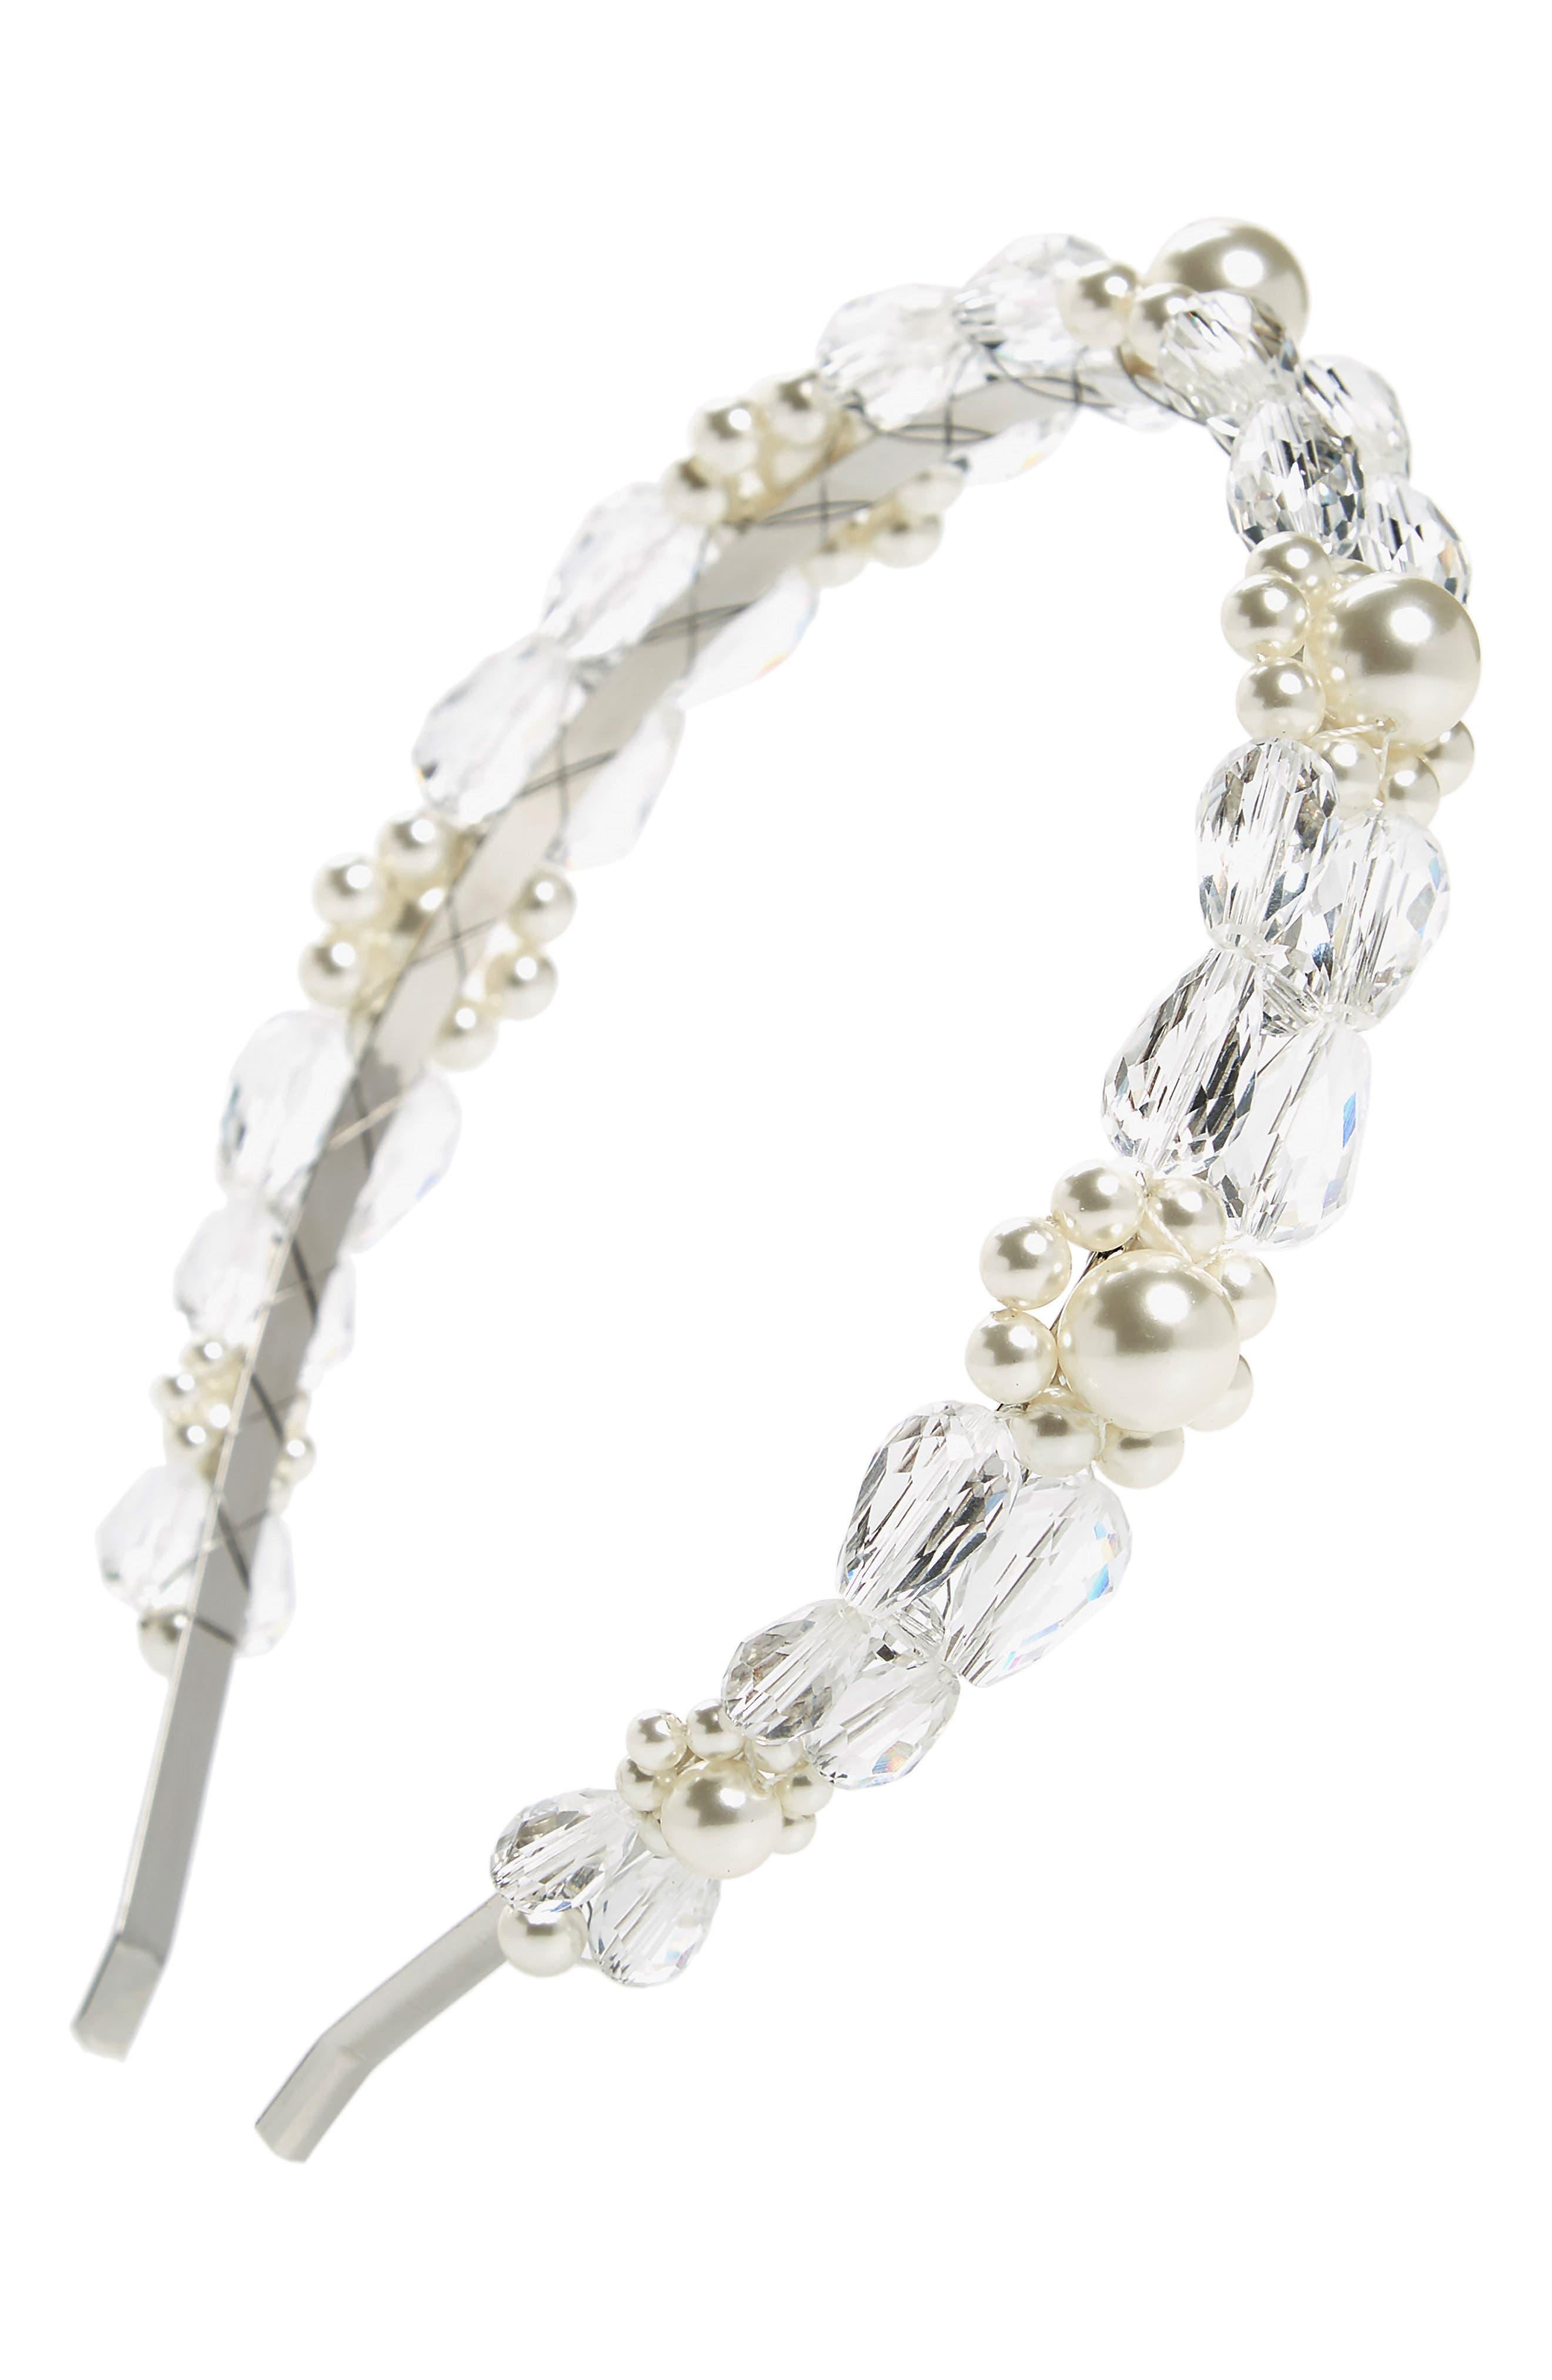 SIMONE ROCHA, Daisy Imitation Pearl & Crystal Headband, Main thumbnail 1, color, CLEAR/ PEARL